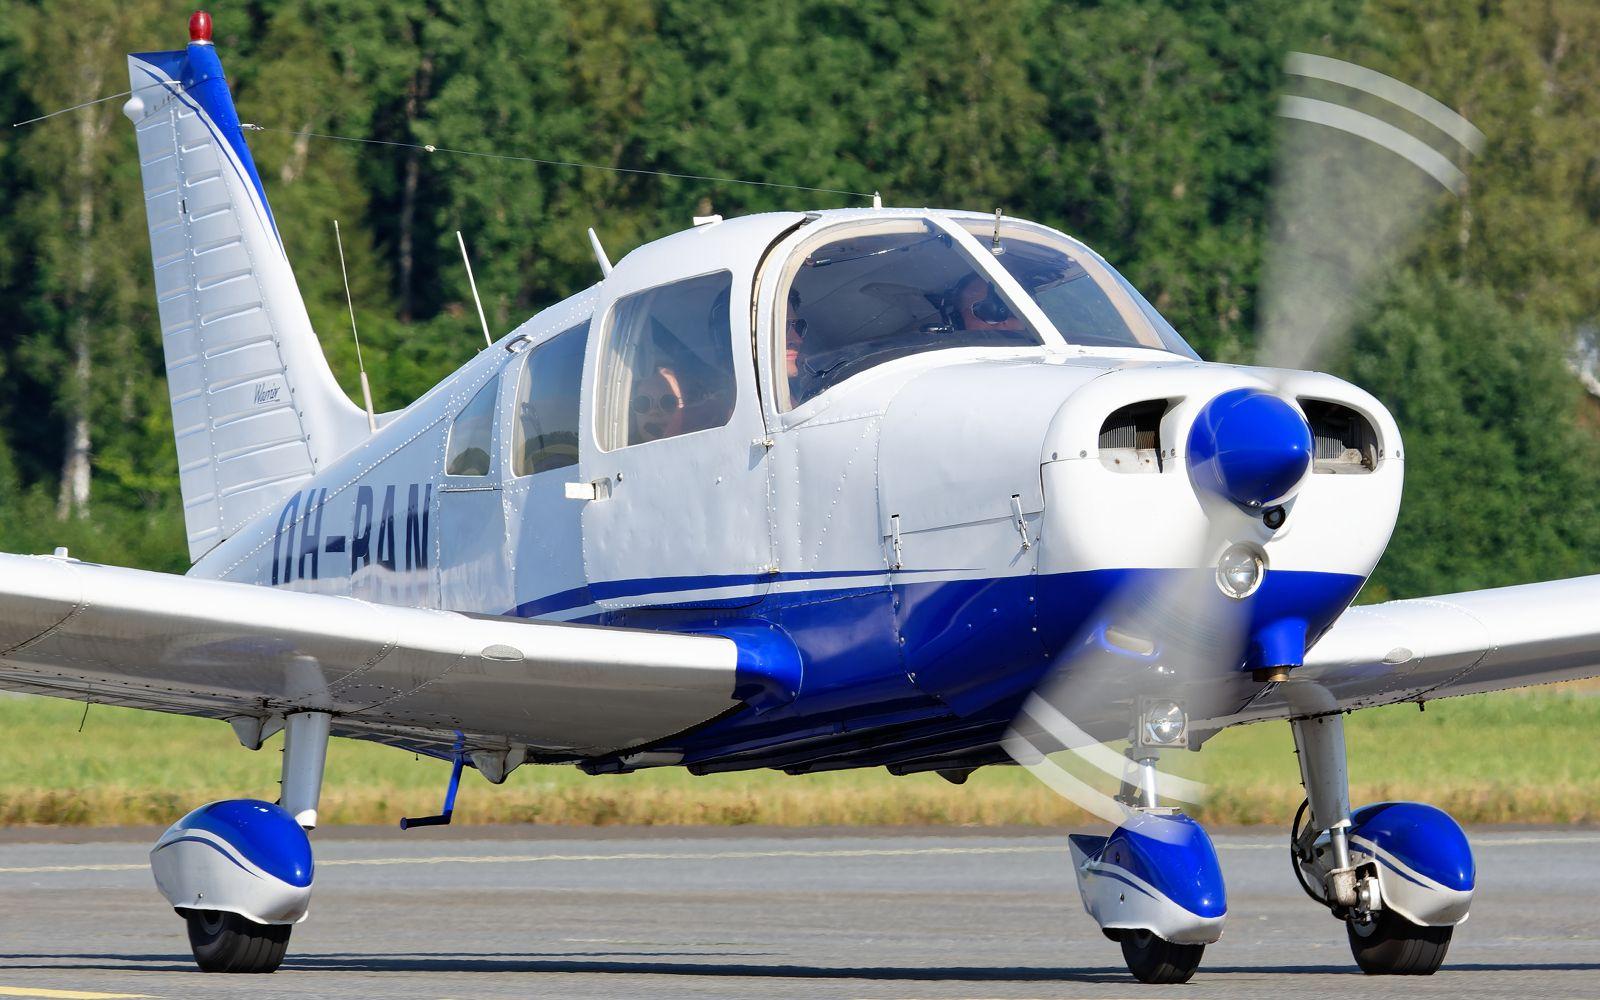 OH-BAN - Piper PA-28-151 Cherokee Warrior - Vaasan Lentokerho - 14.7.2021